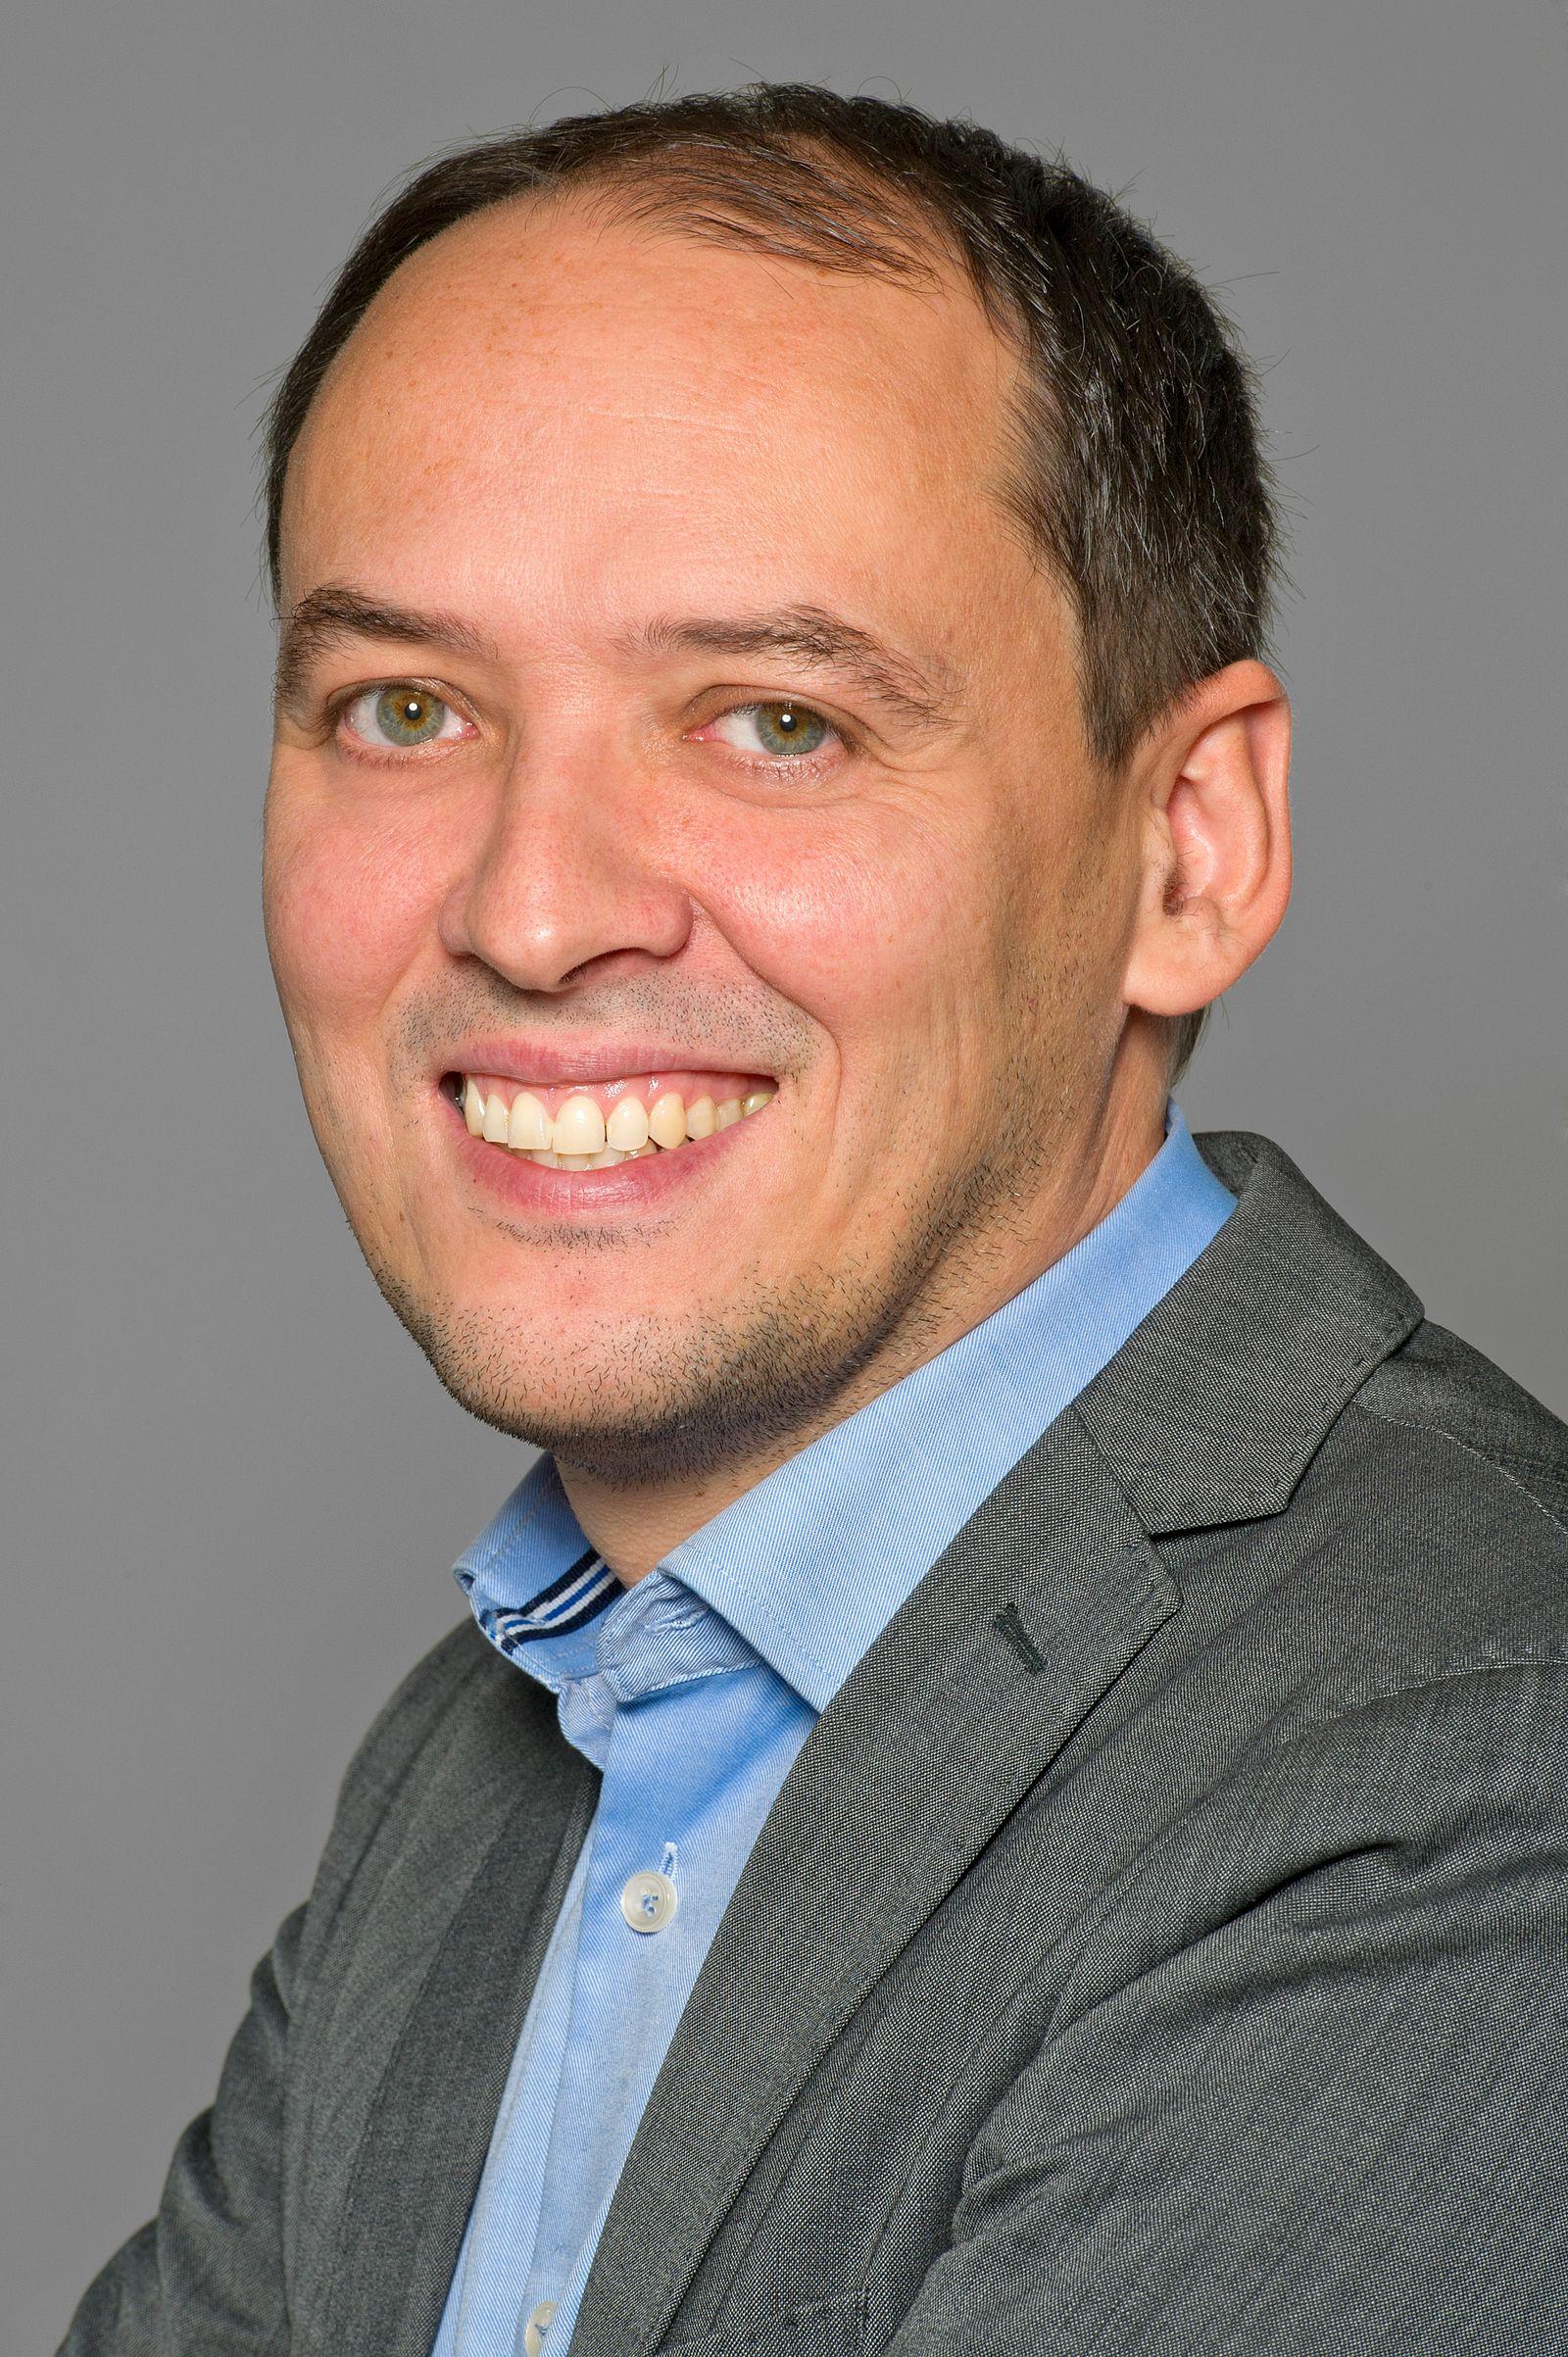 Christian Gerlitz